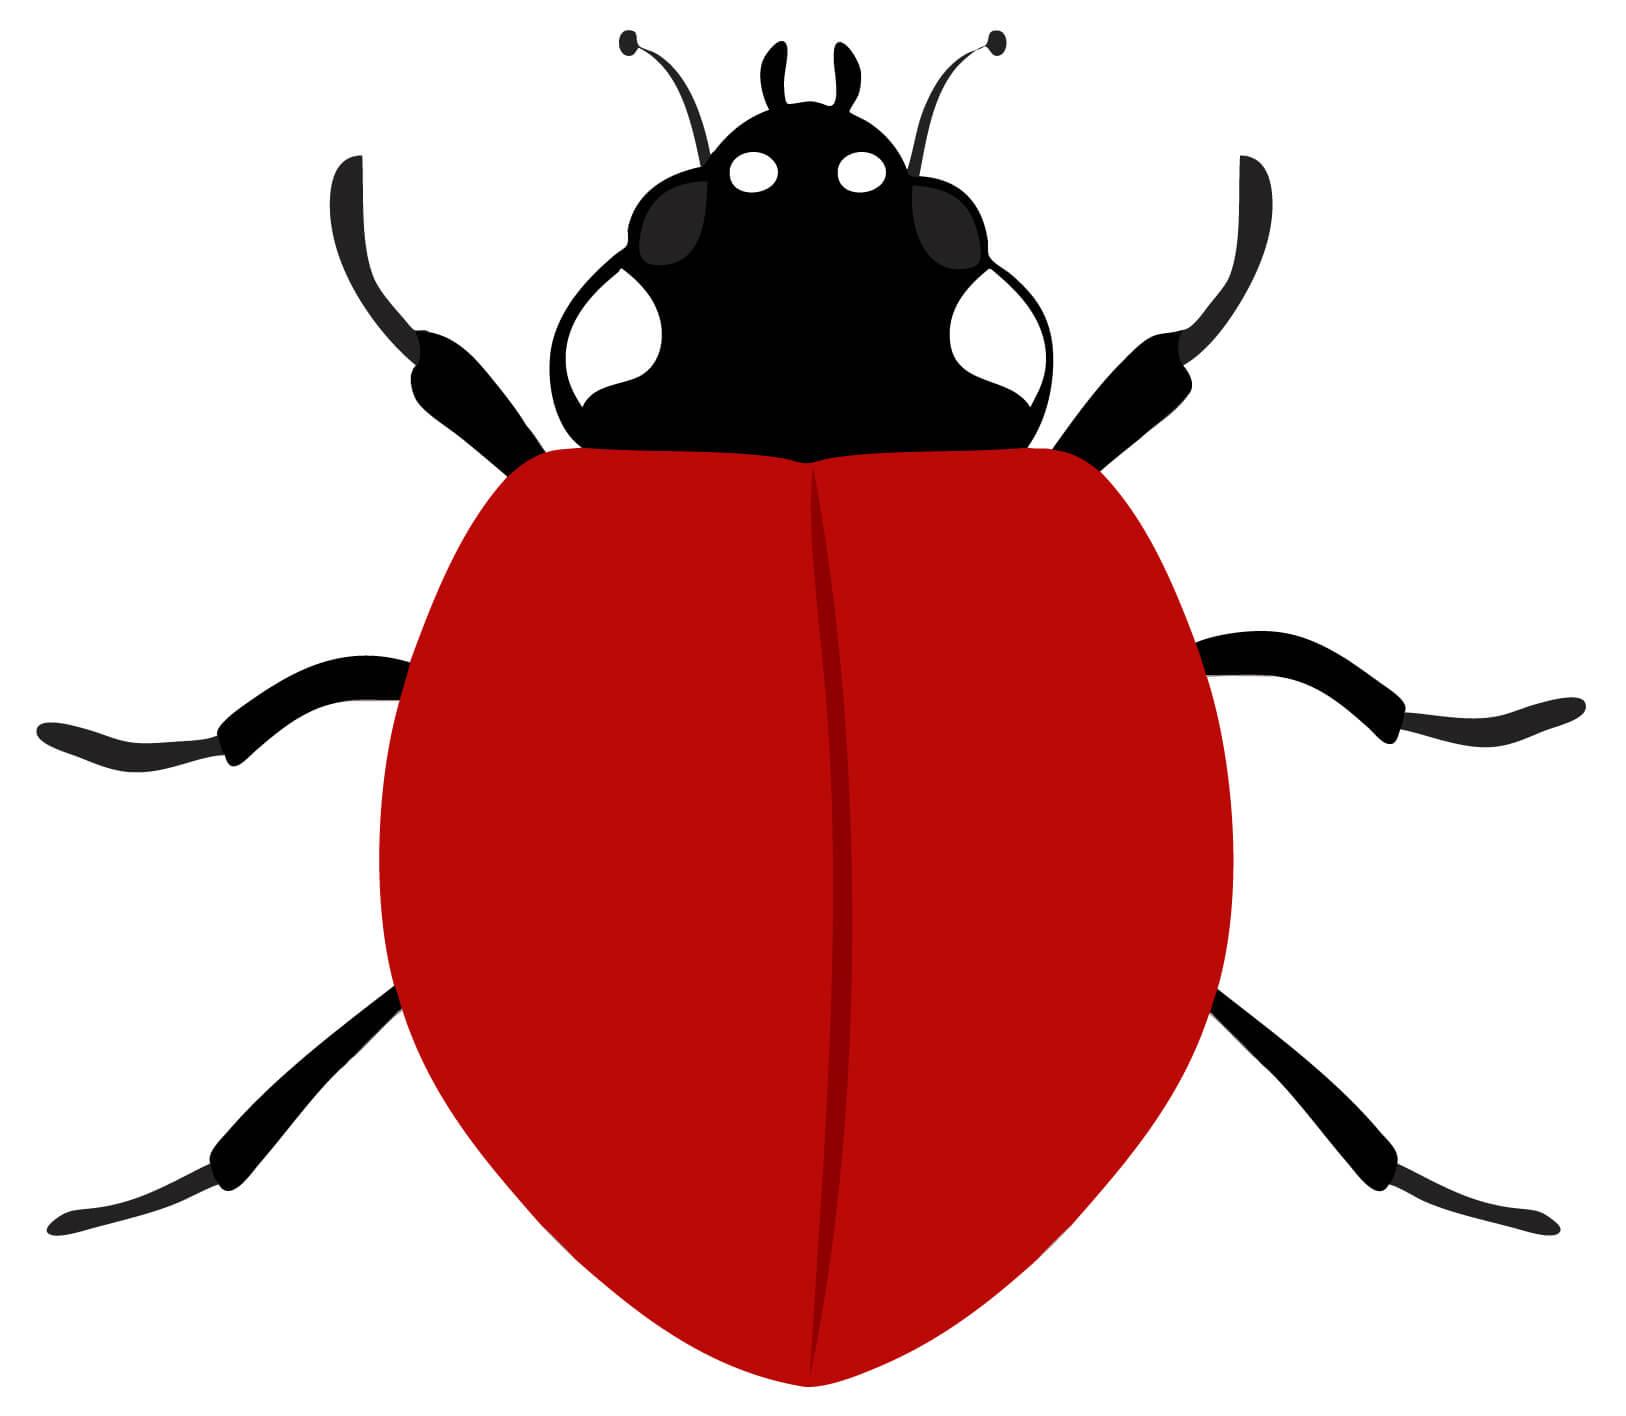 Ladybird Template. Ladybird Powerpoint Template Backgrounds With Blank Ladybug Template